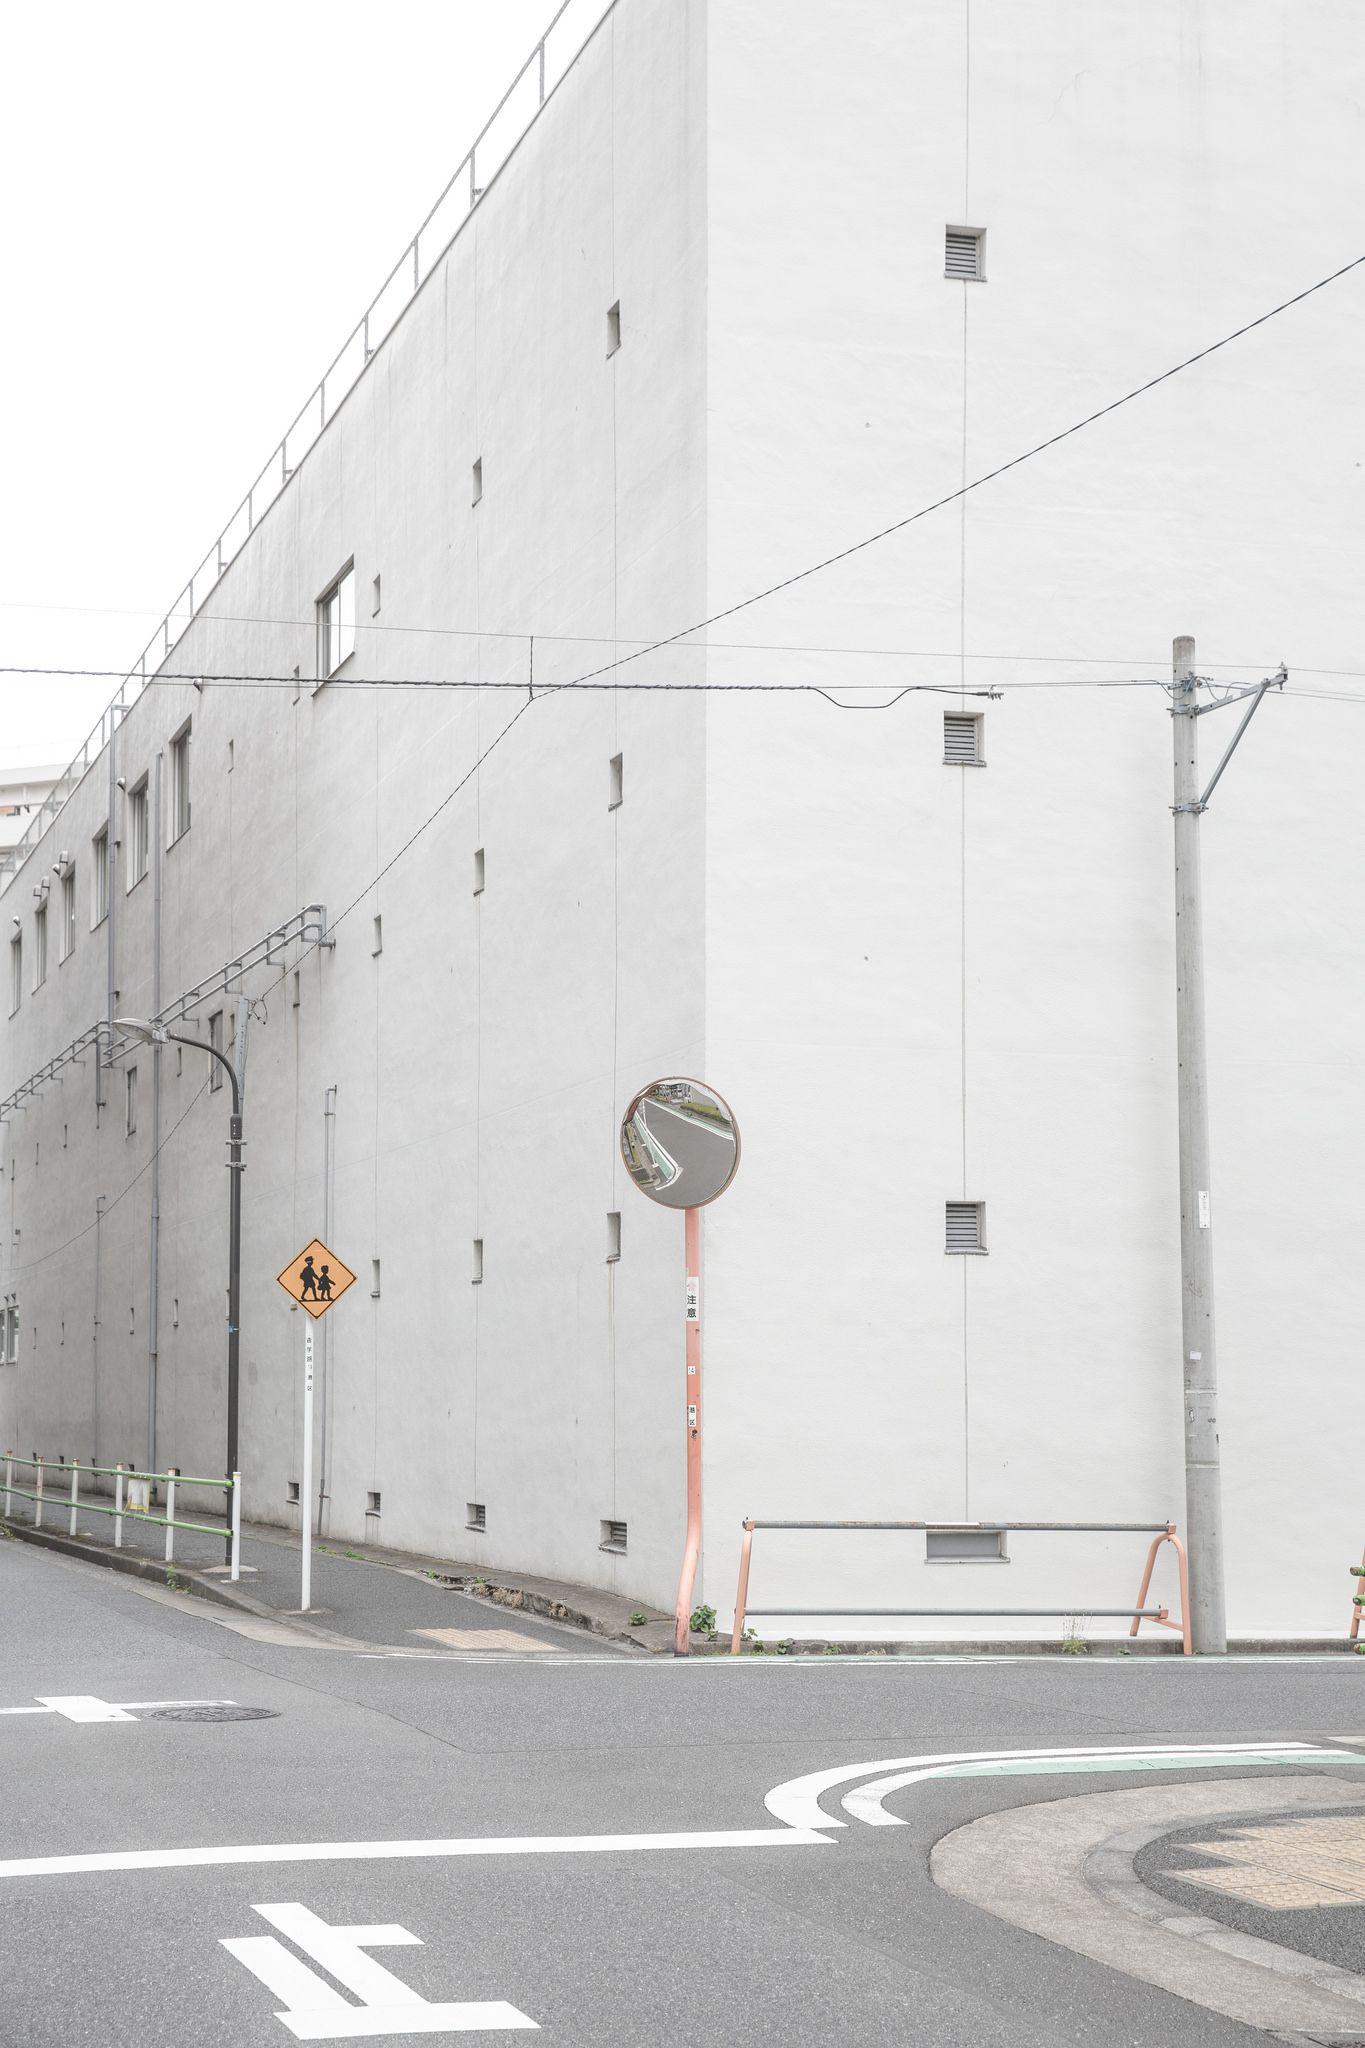 Street Tokyo 3 Minimalist Photography Scenery Wallpaper Sky Aesthetic